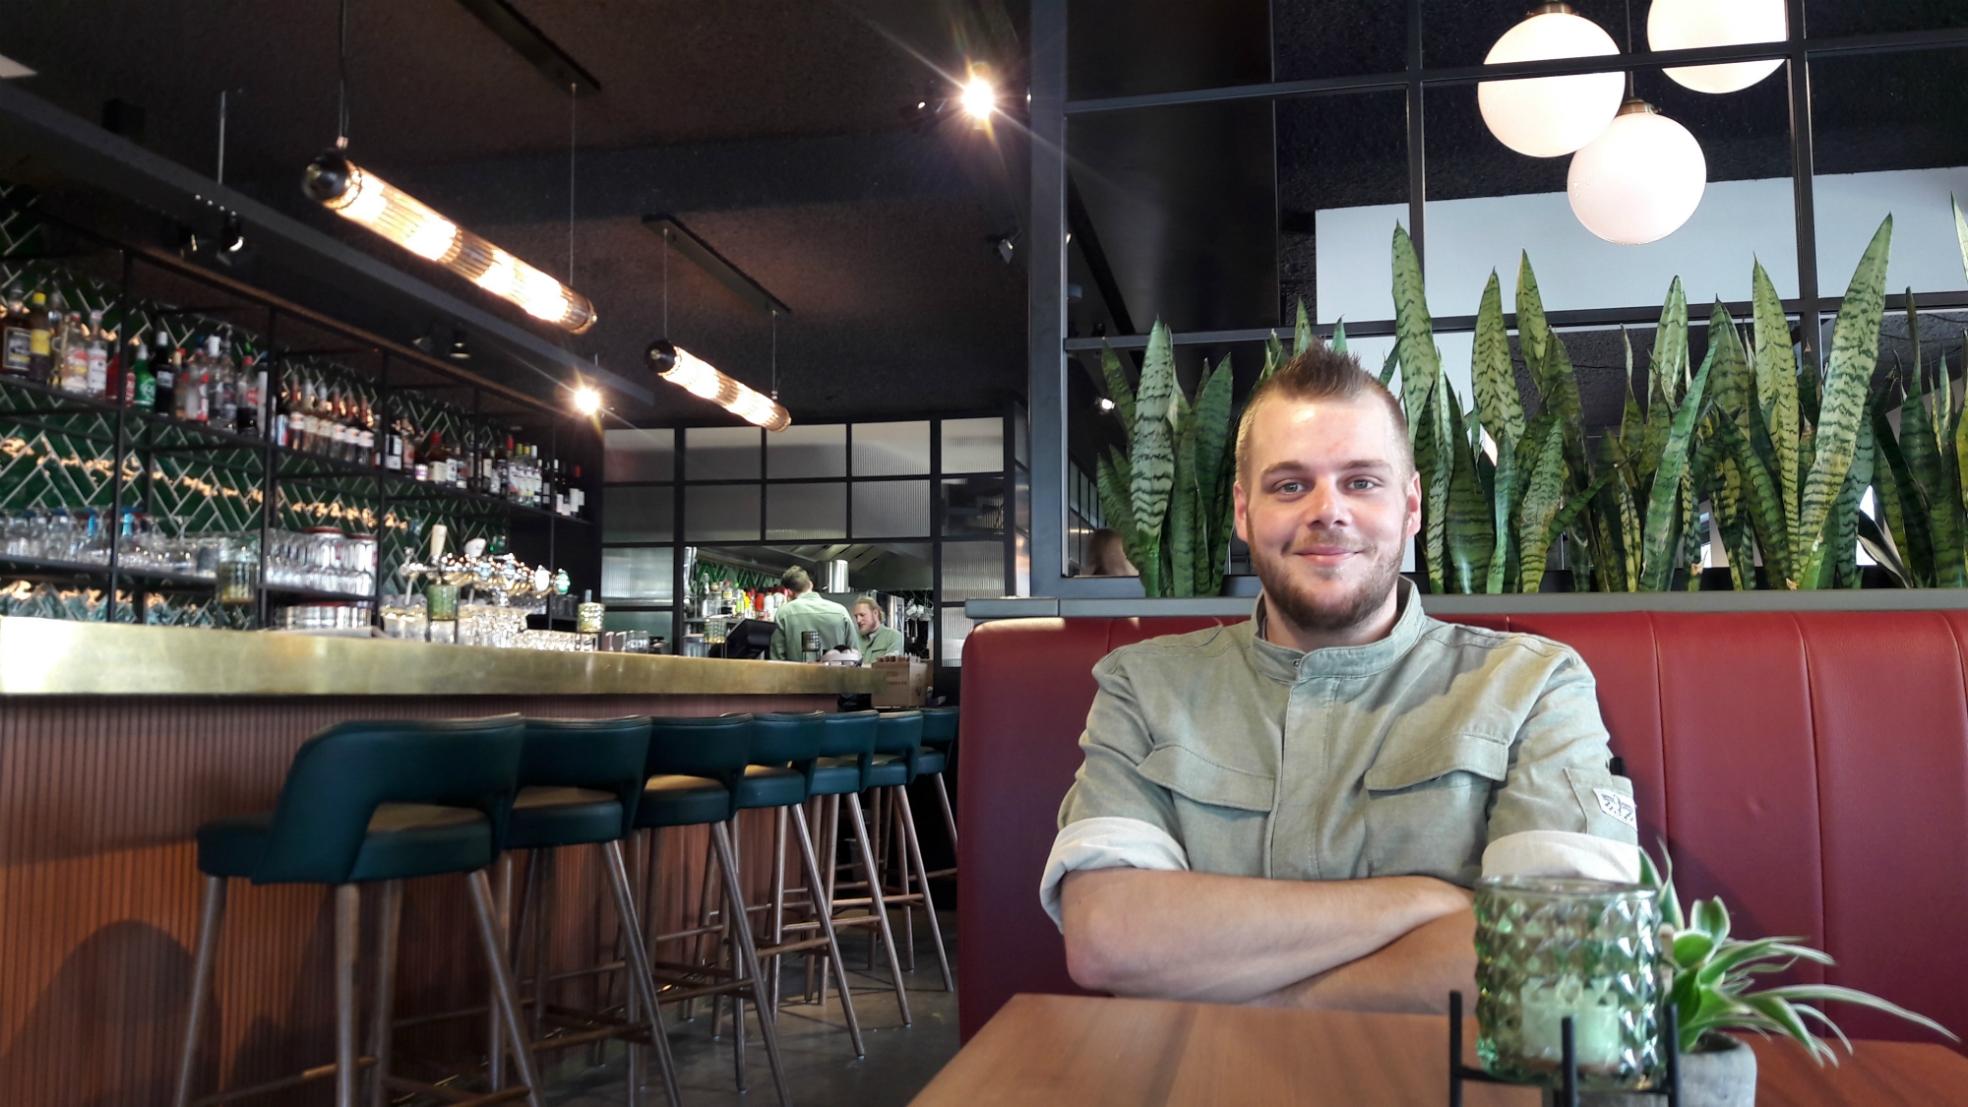 Ricky Spijker Horeca Corona bezorgen Nood Deugd